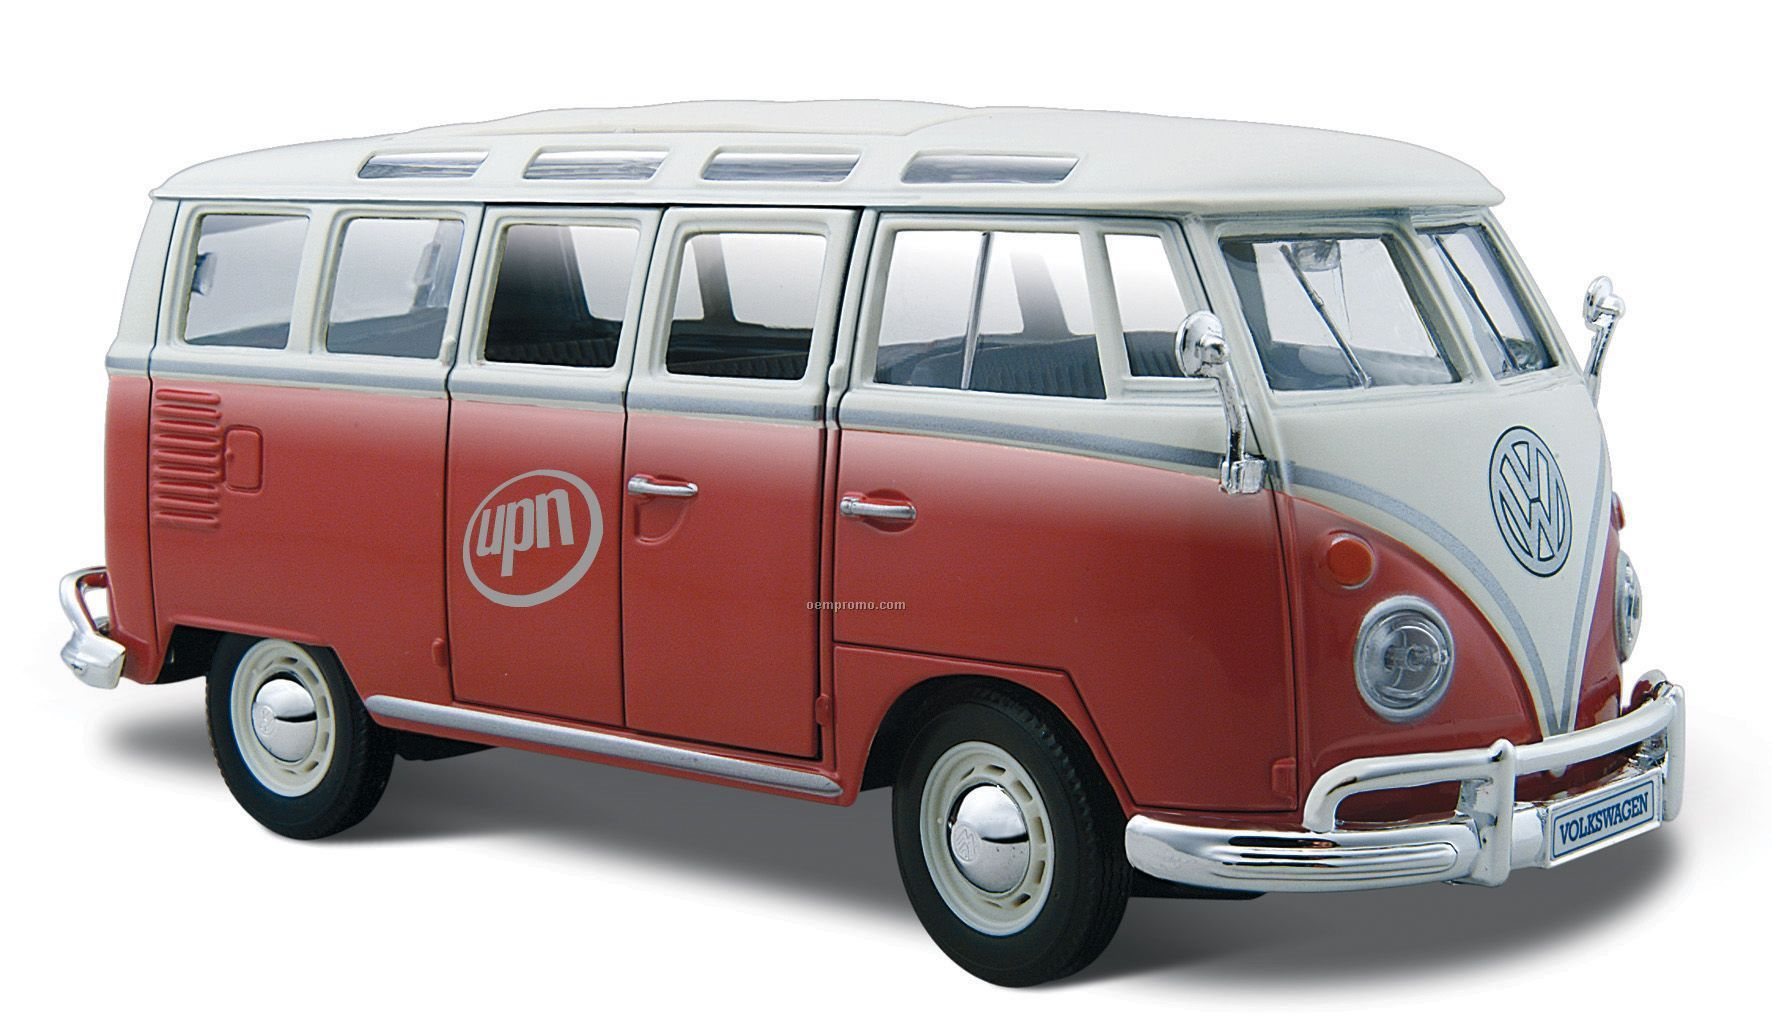 "7""X2-1/2""X3"" Red/White Vw Samba Bus Die Cast Replica Car"